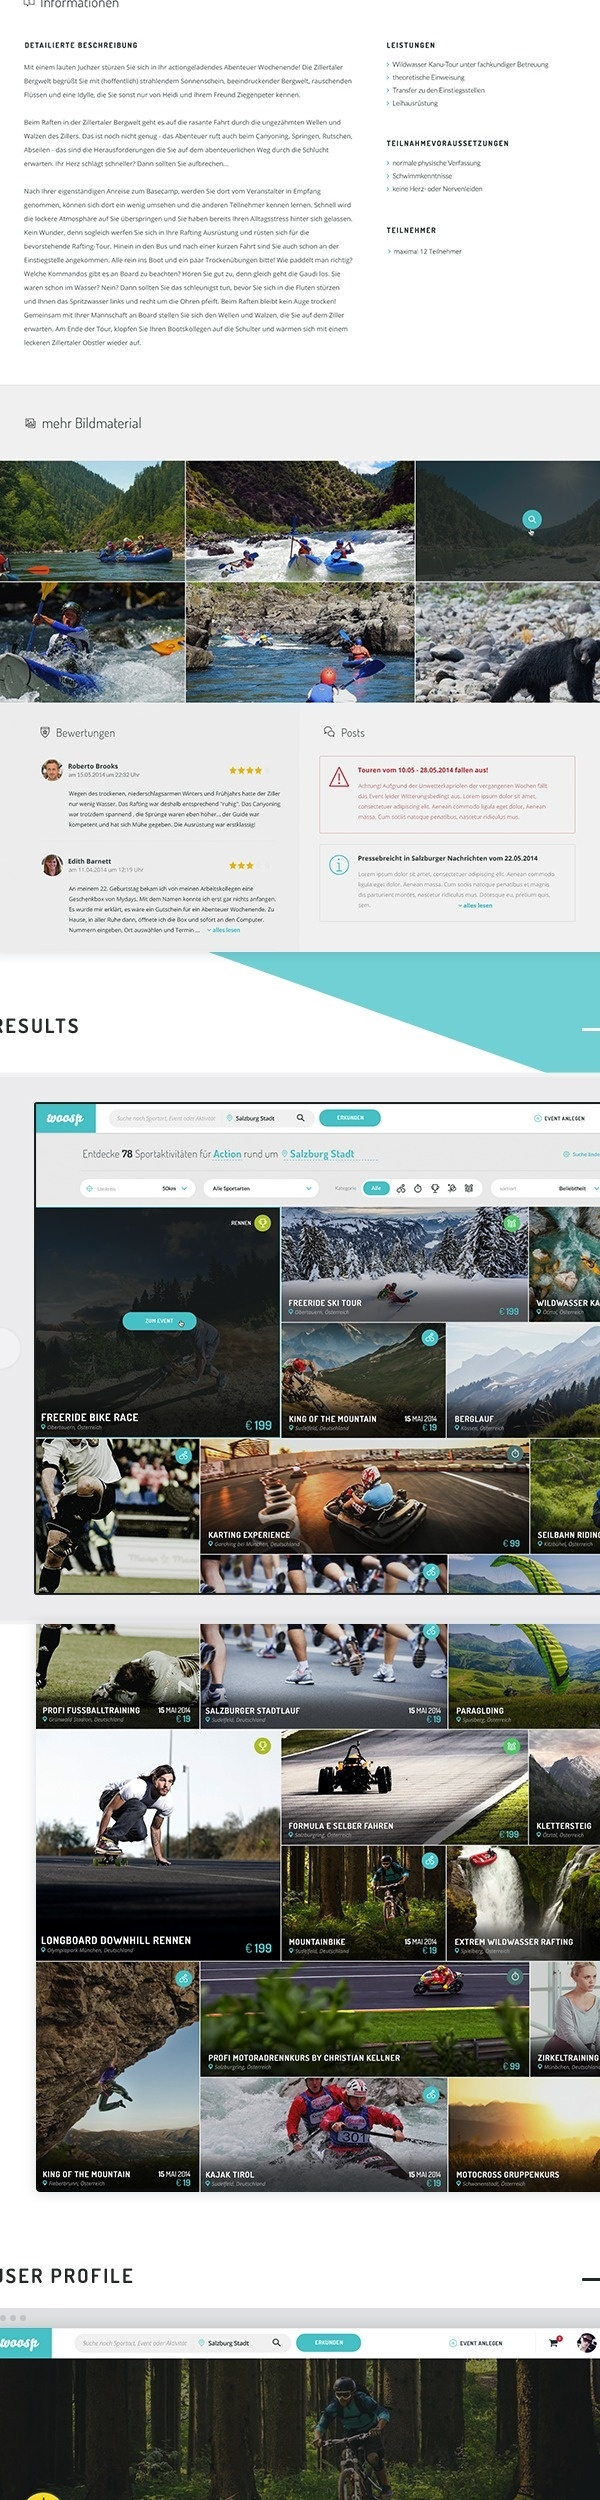 Woosp Website Redesign on Behance #web